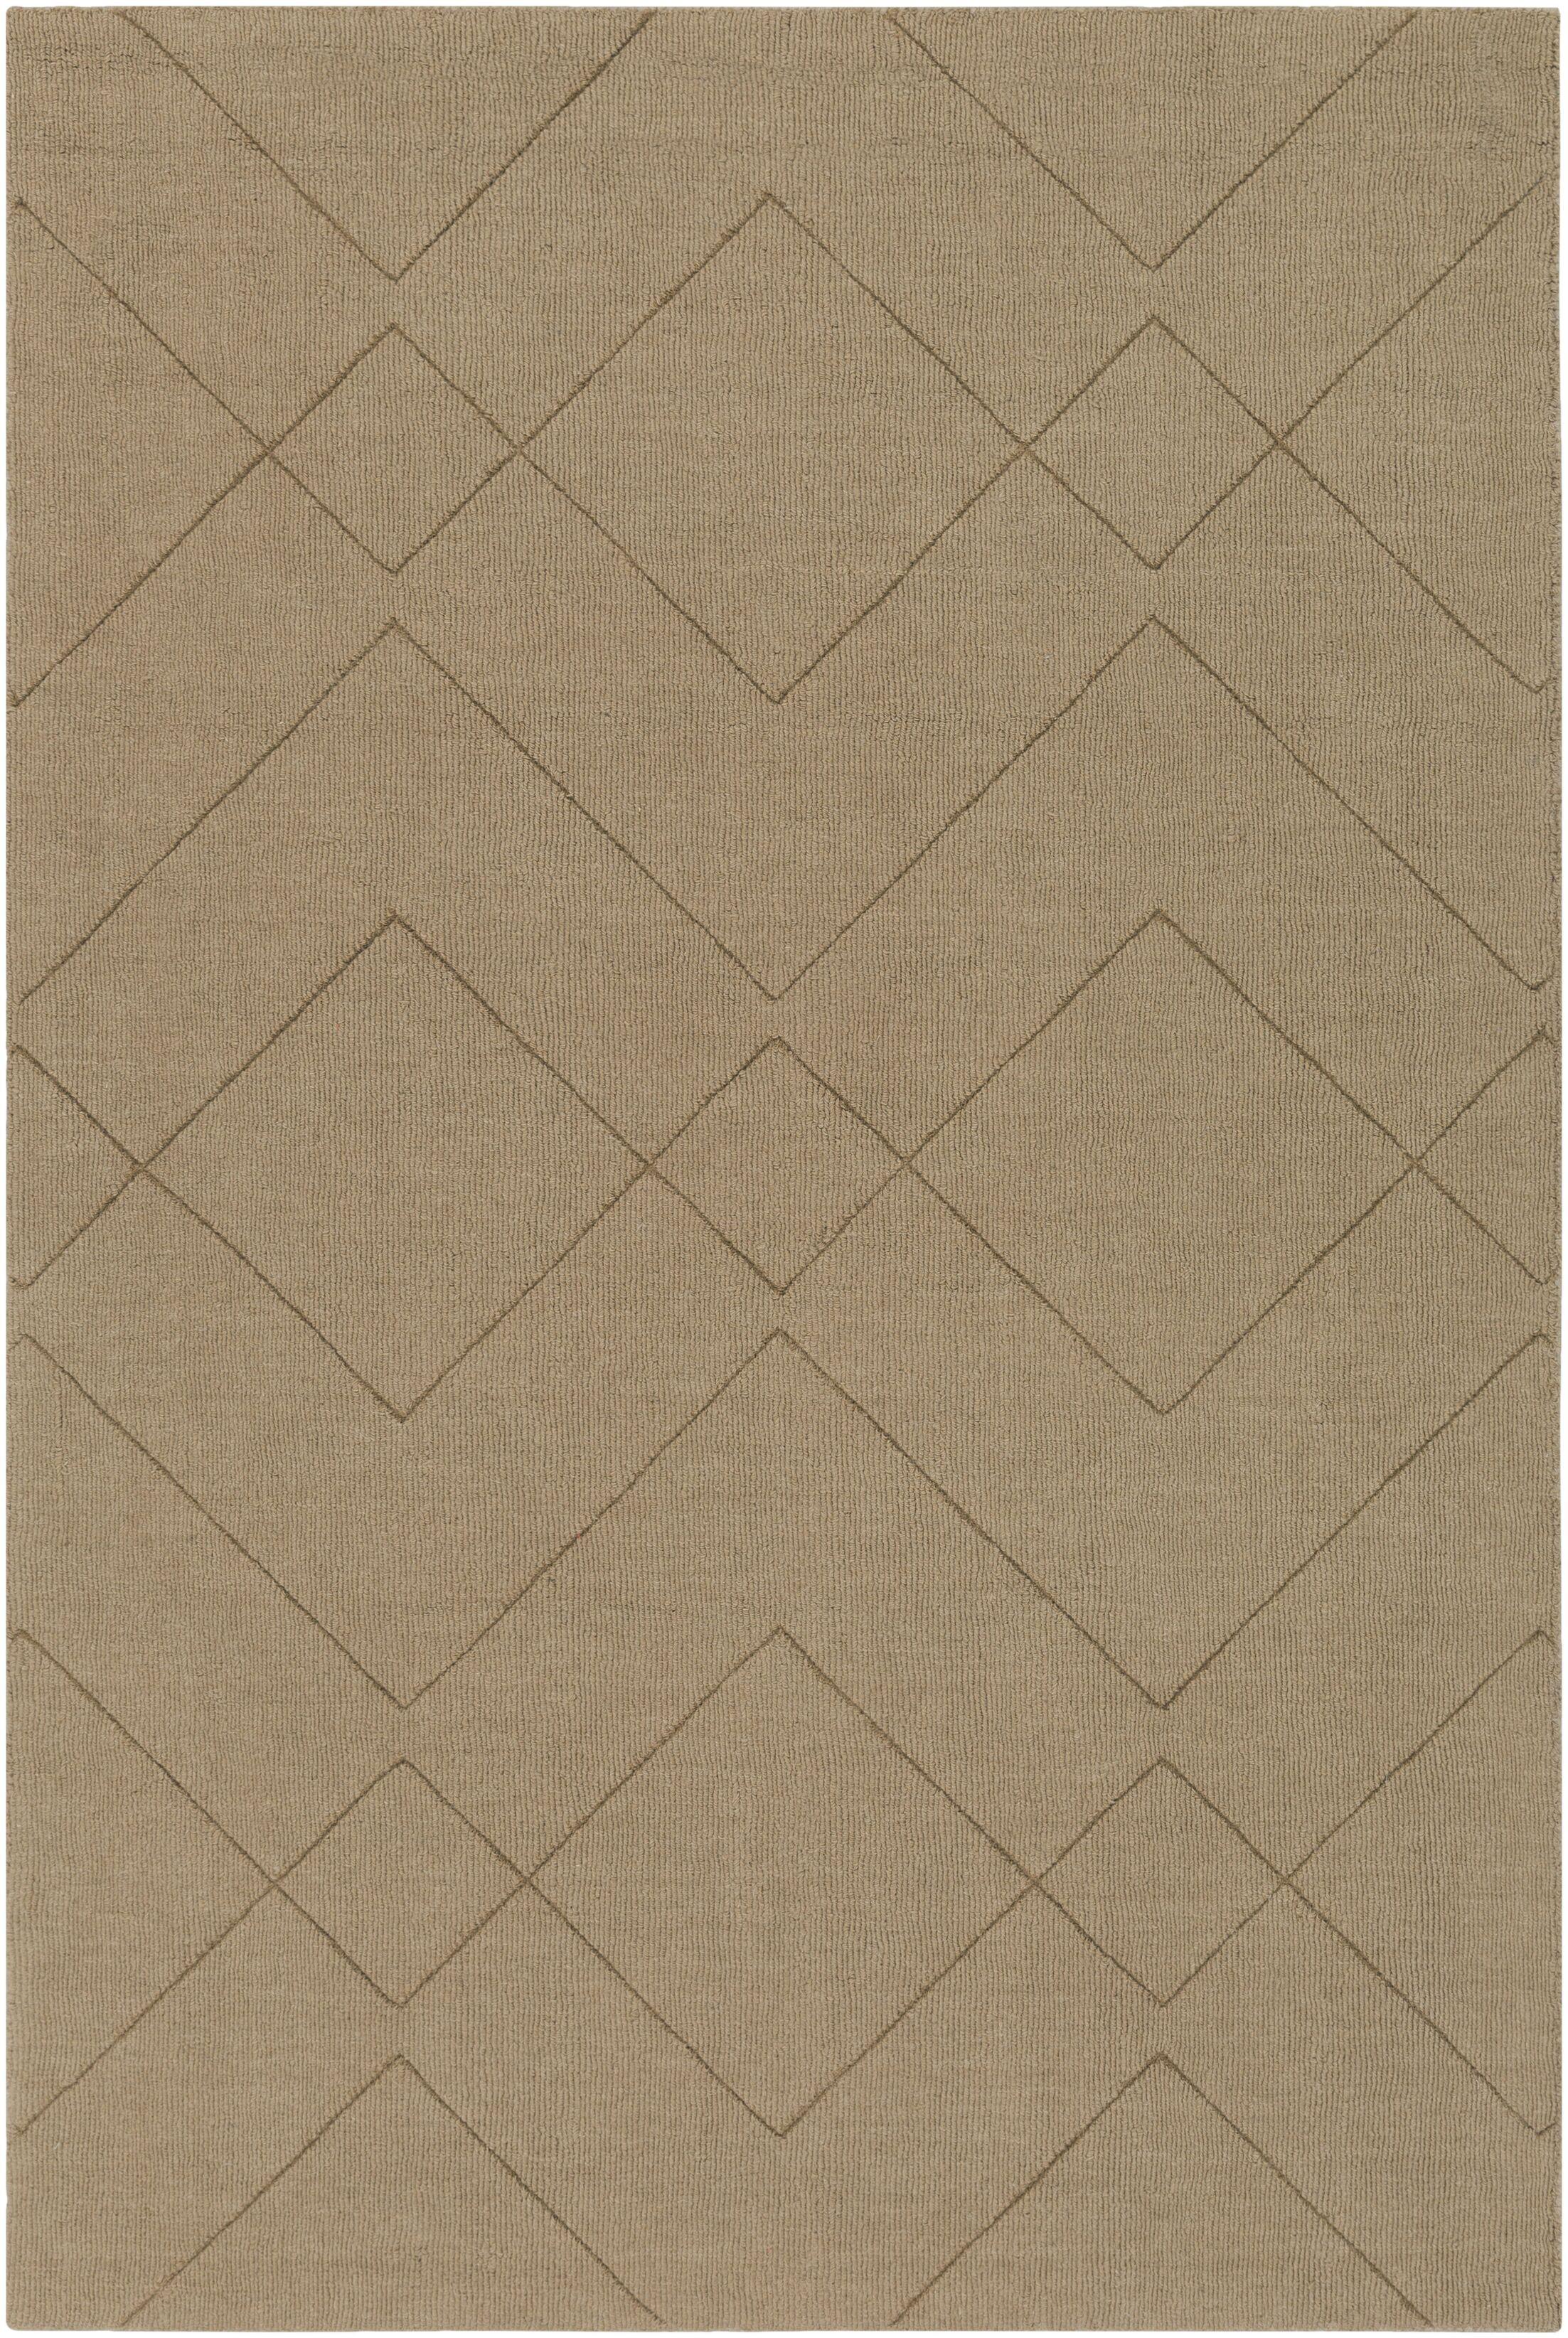 Matteson Hand-Loomed Khaki Area Rug Rug Size: Rectangle 5' x 7'6